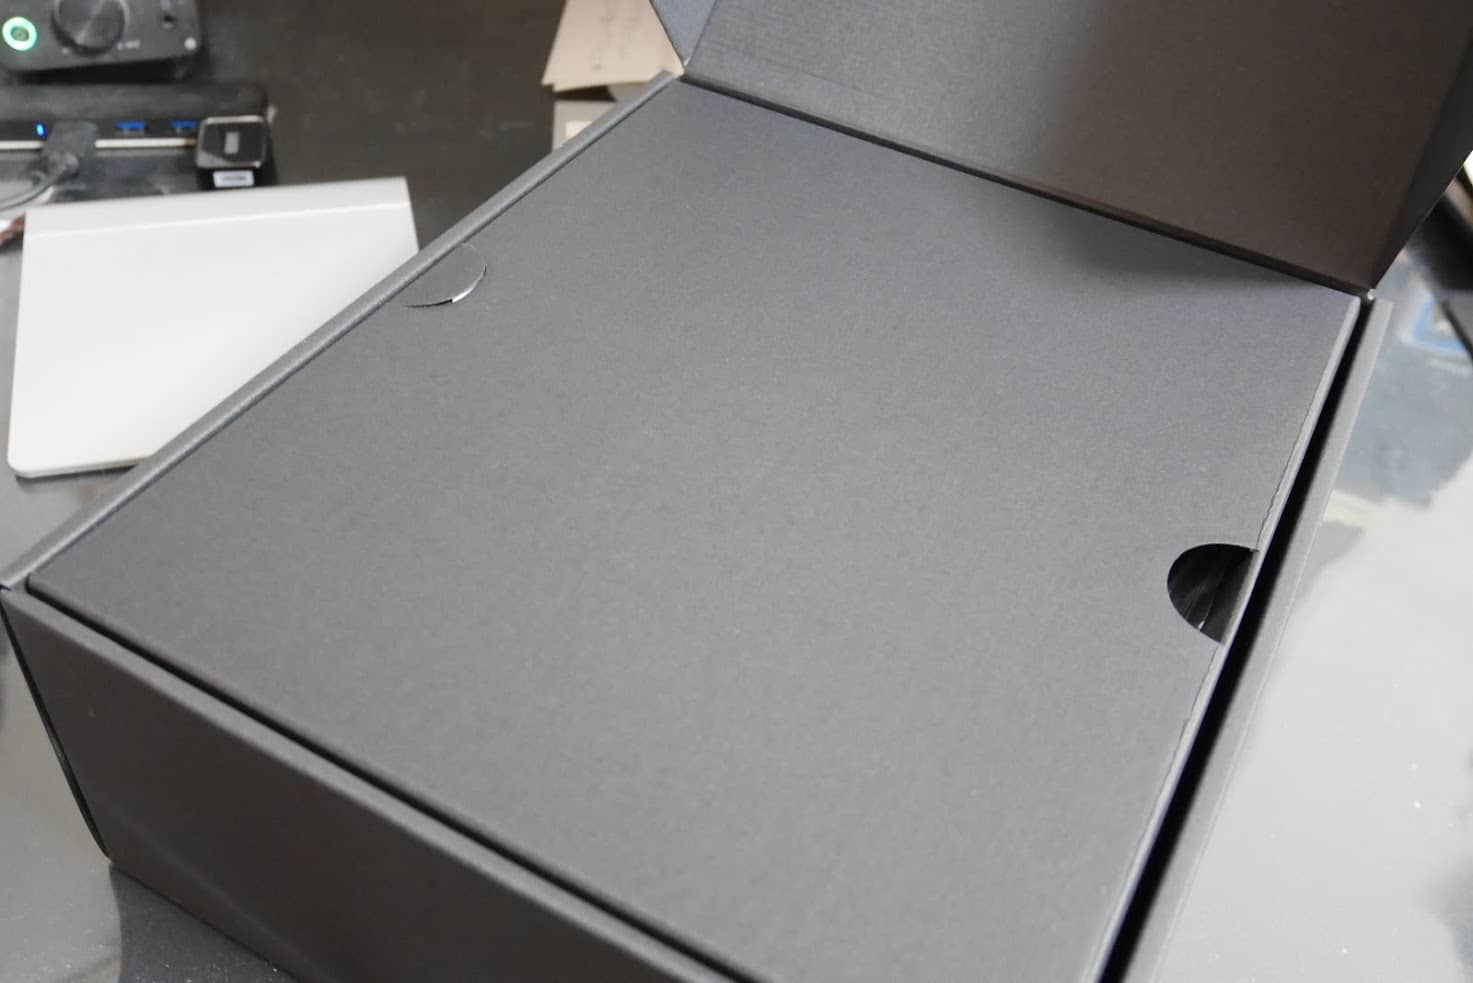 Audio-technica-ATH-MSR7-内箱の内箱